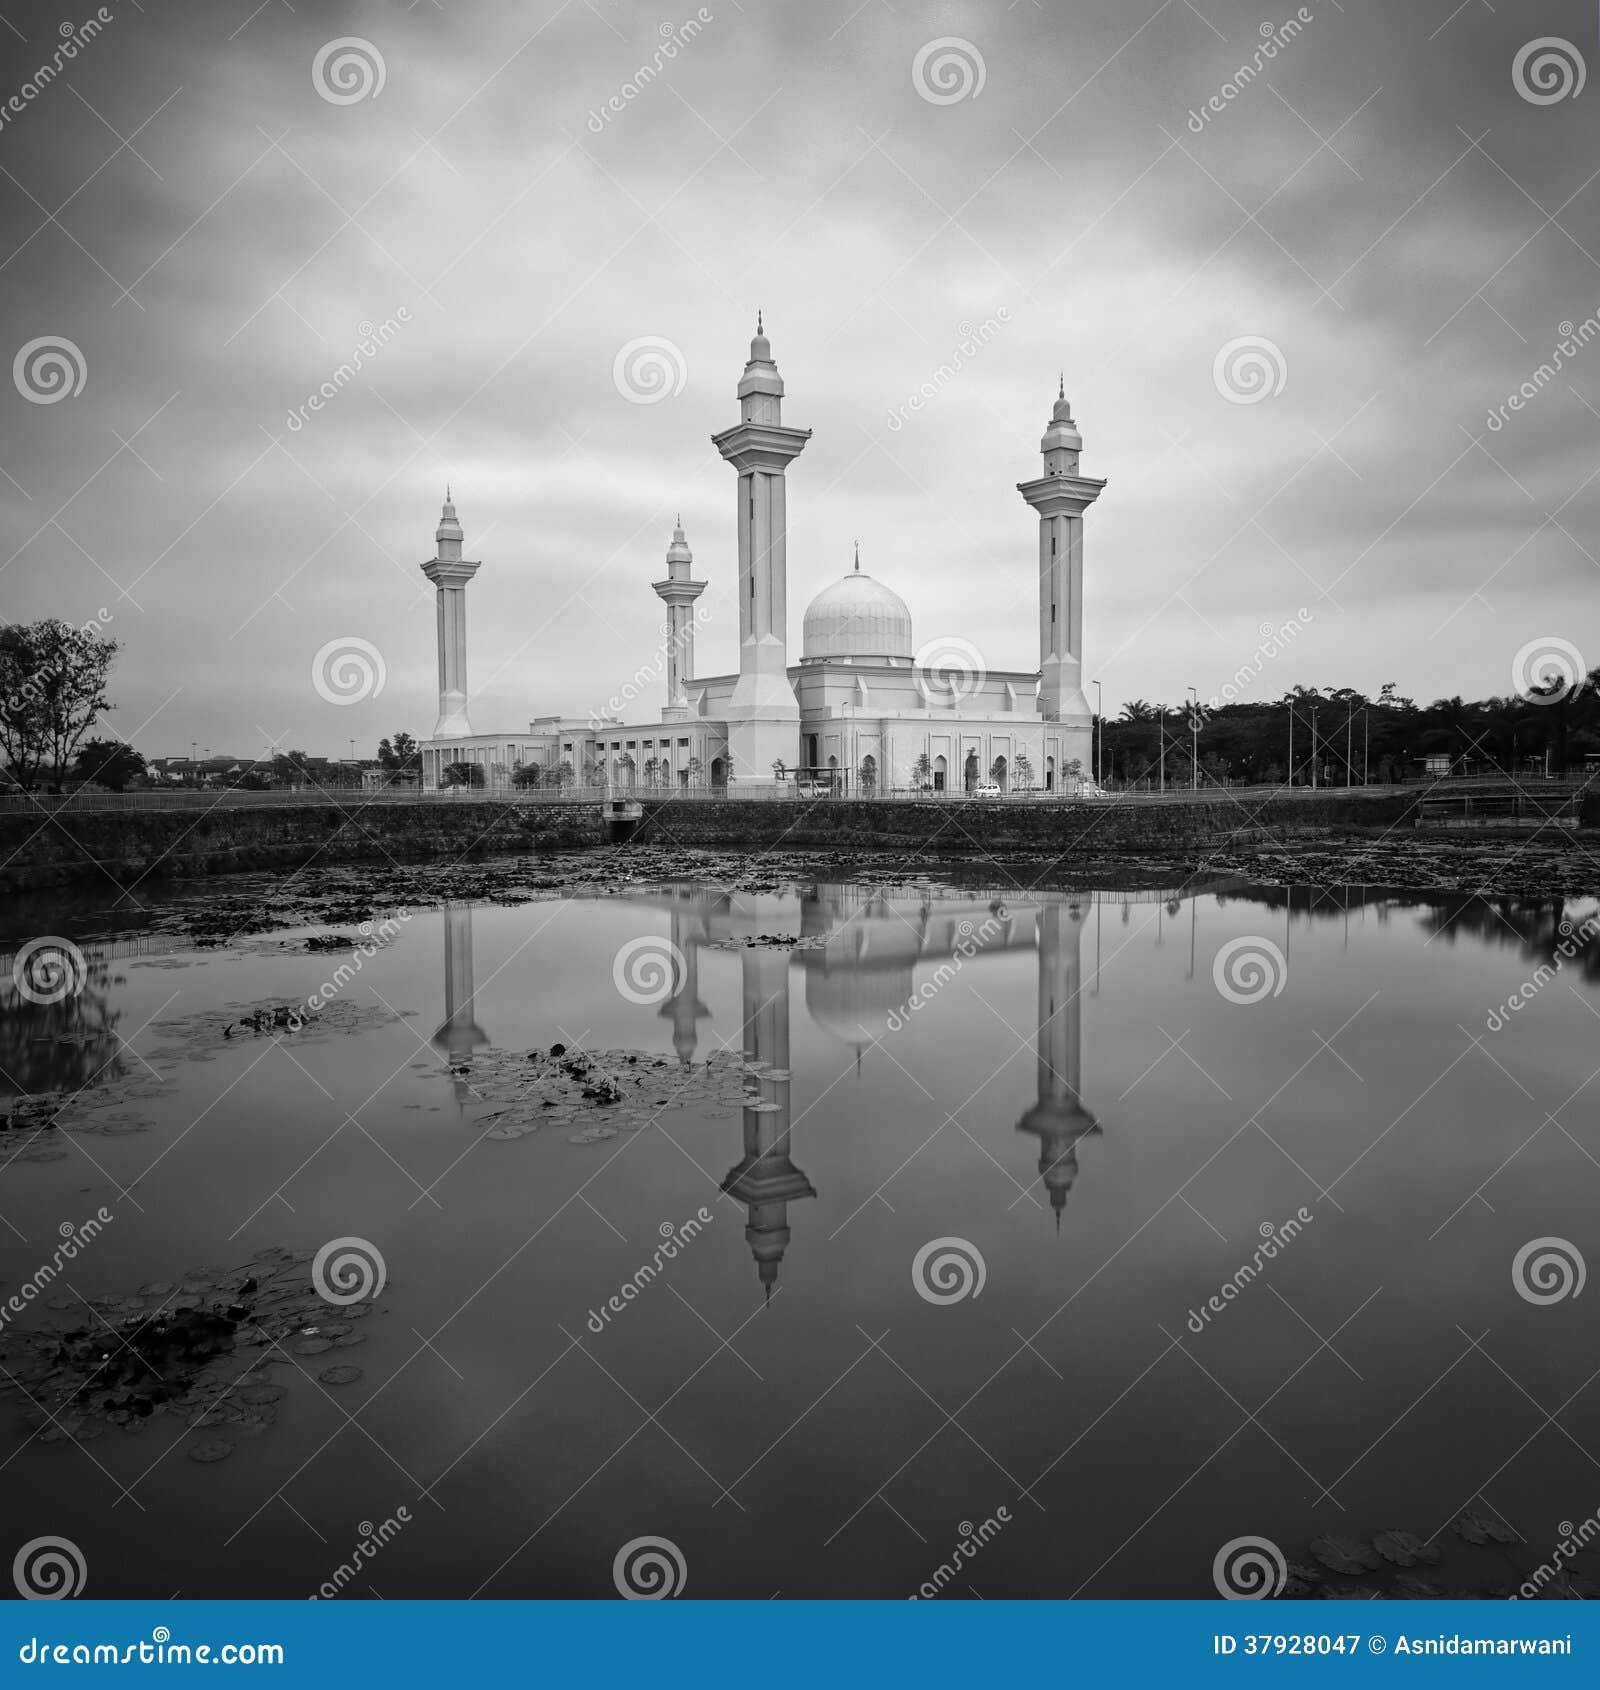 Мечеть Tengku Ampuan Jemaah, Bukit Jelutong, Малайзия